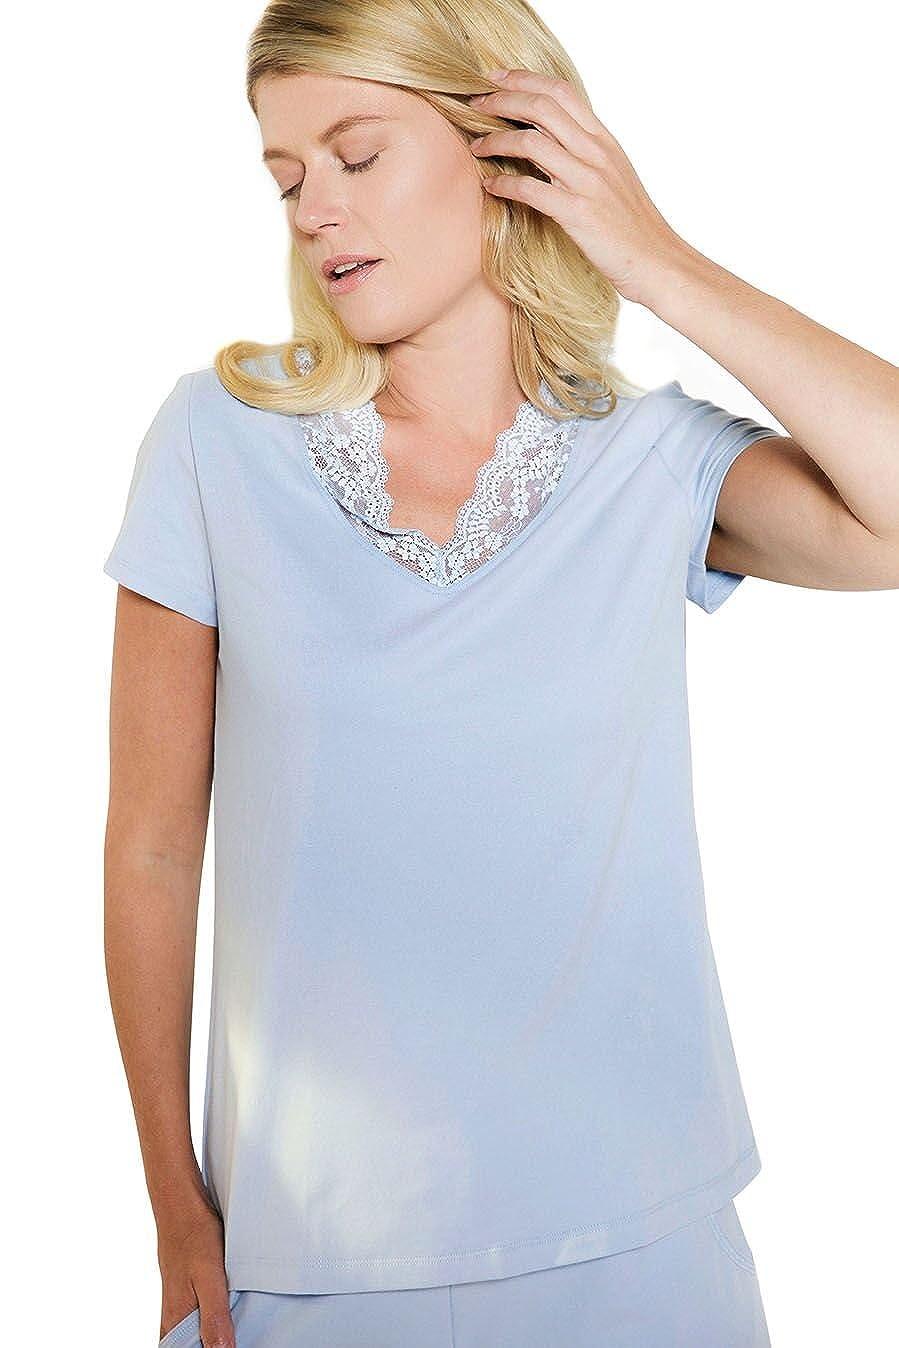 Lusome Everyday Womens Moisture Wicking Nina Sleep T-Shirt Size XS-XL